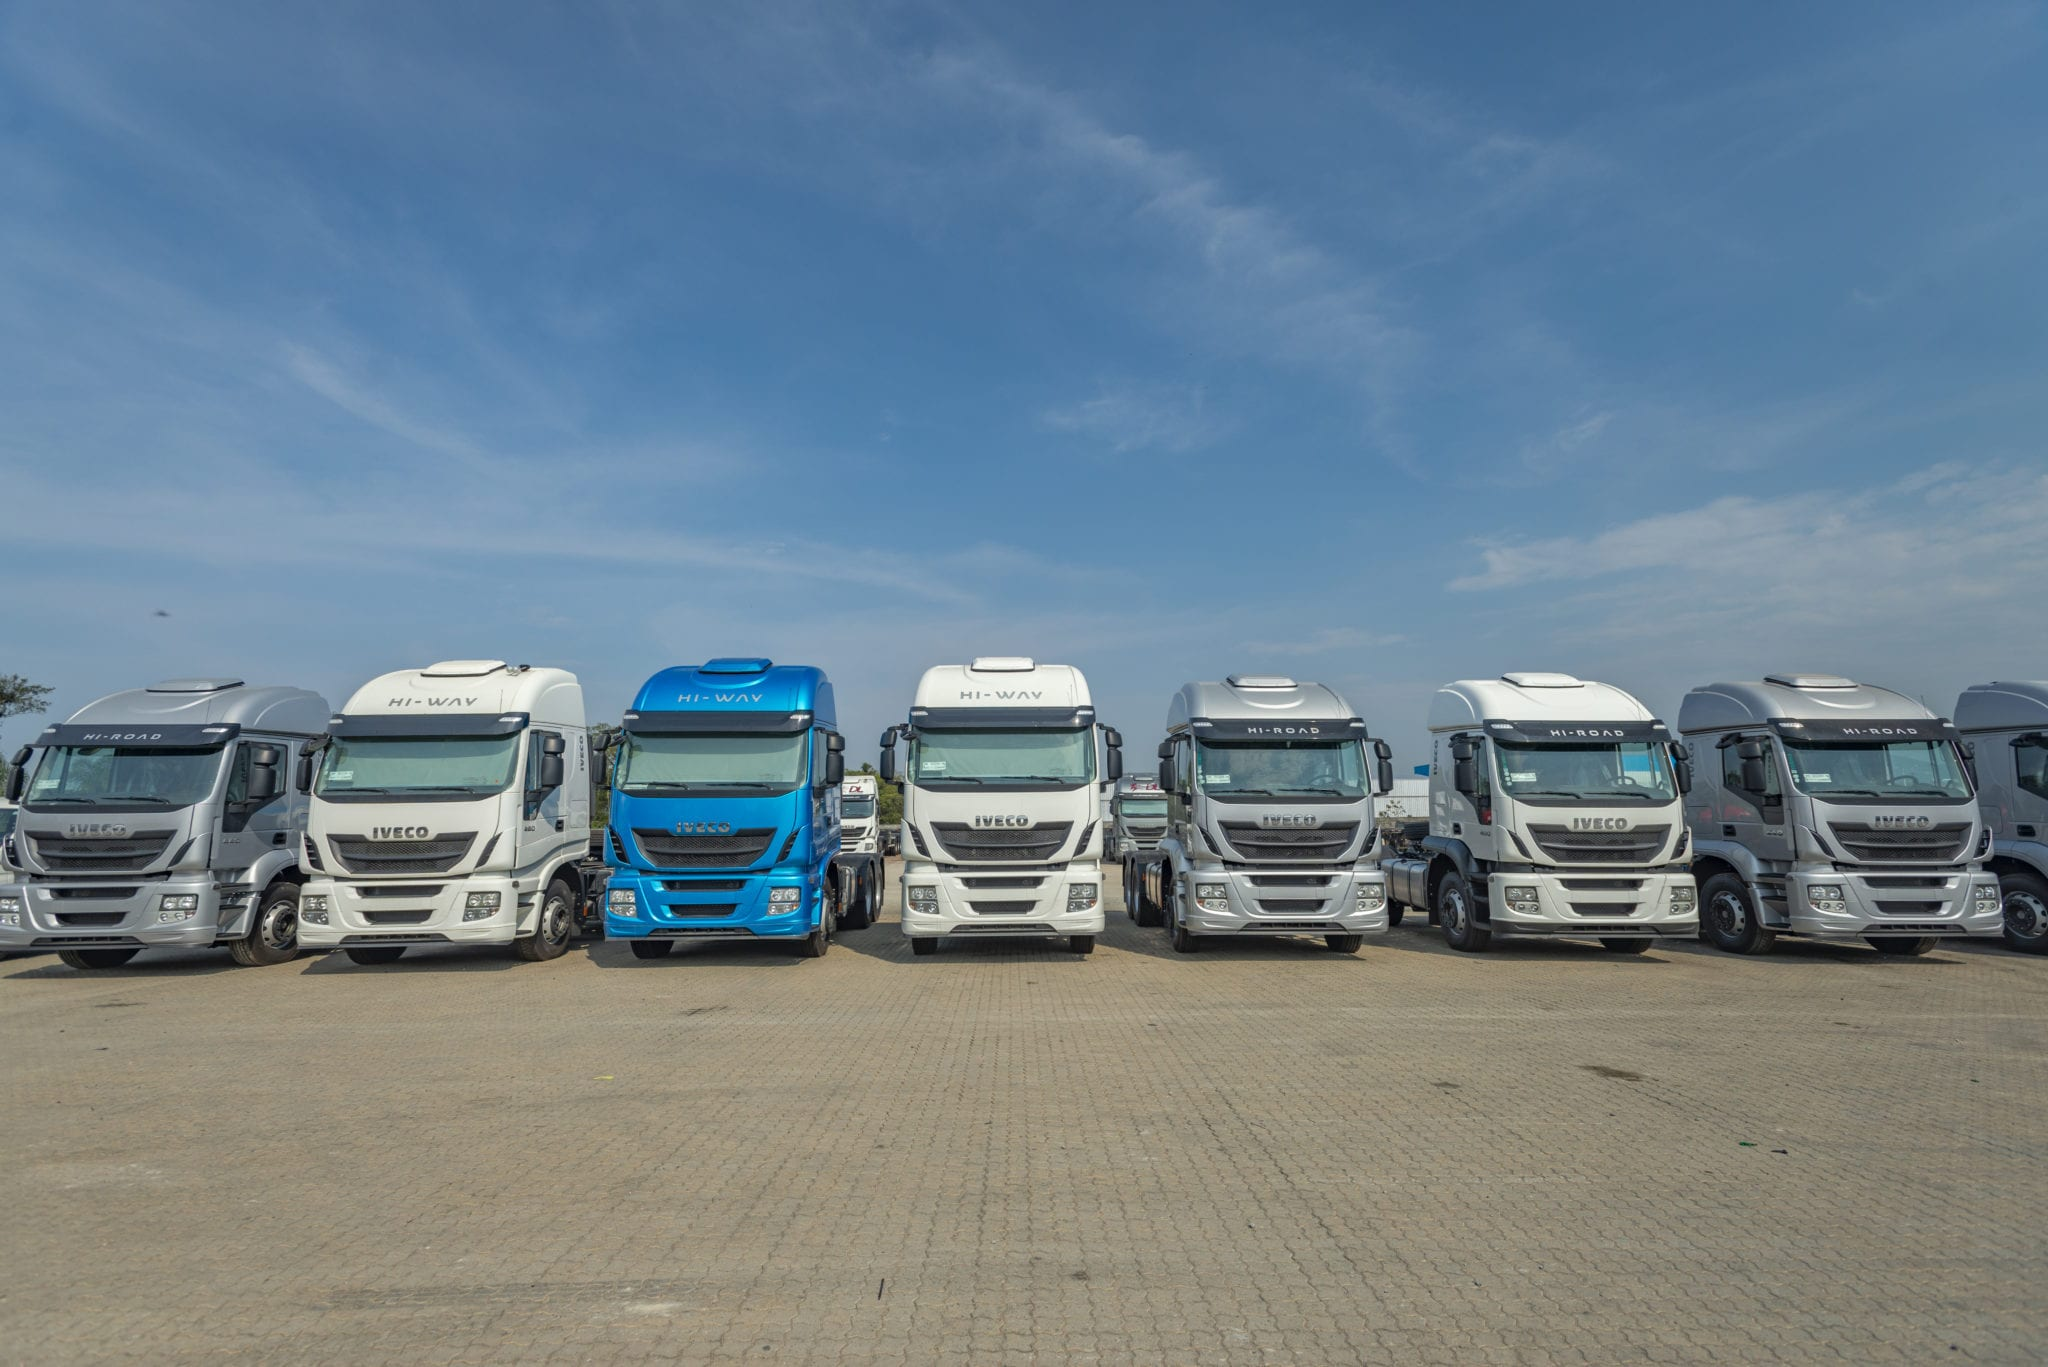 Carboni Iveco de Itajaí ultrapassa a marca de 1.000 caminhões vendidos